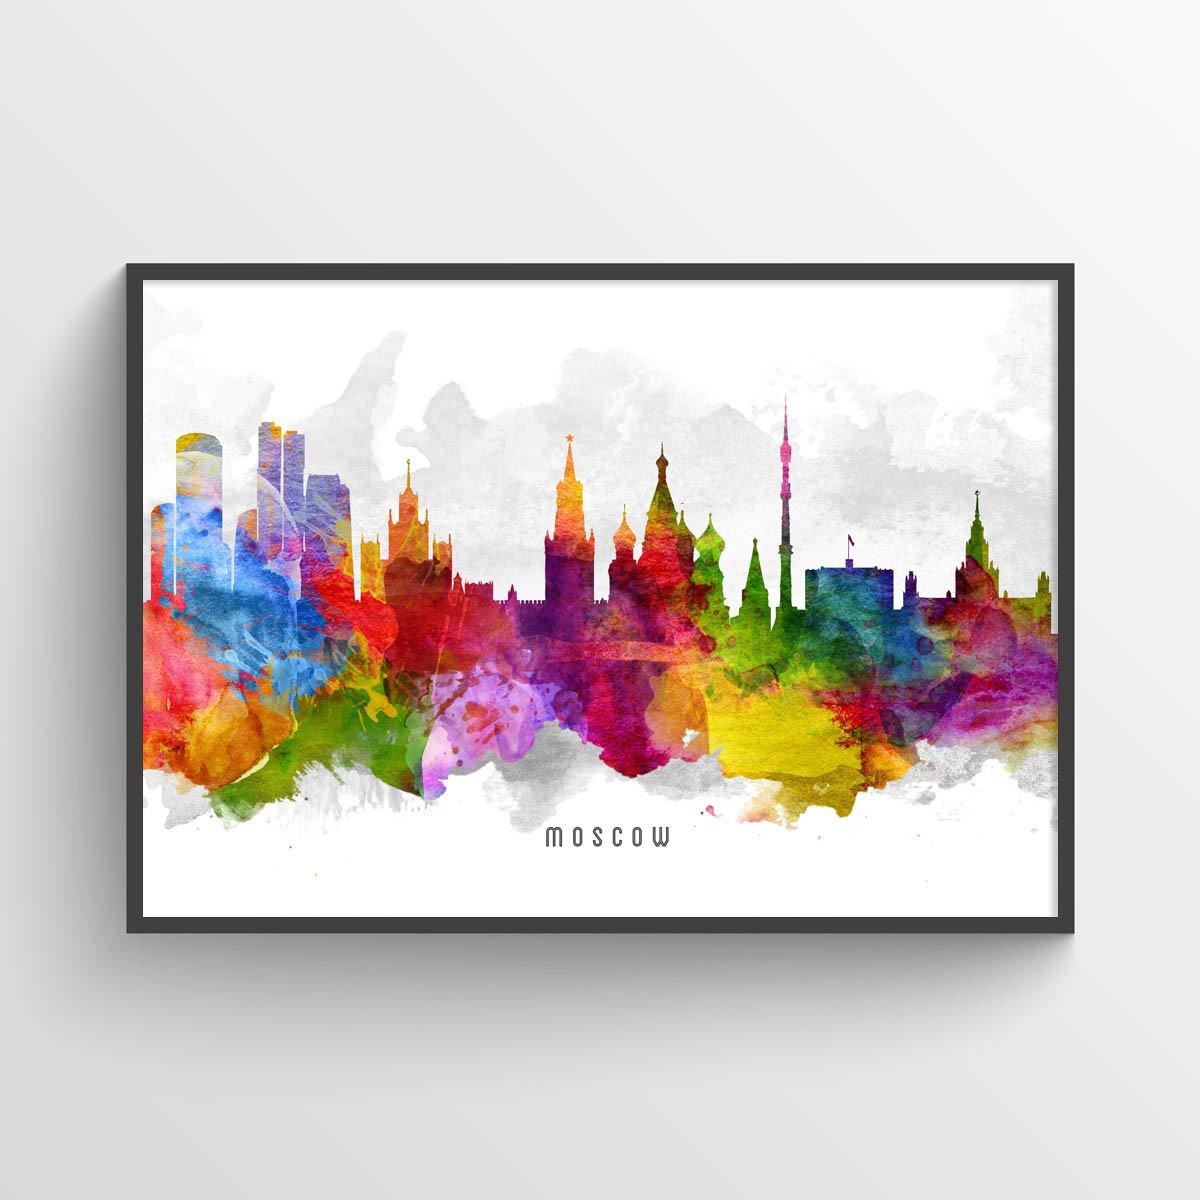 1200x1200 Moscow Skyline Watercolor Art Print